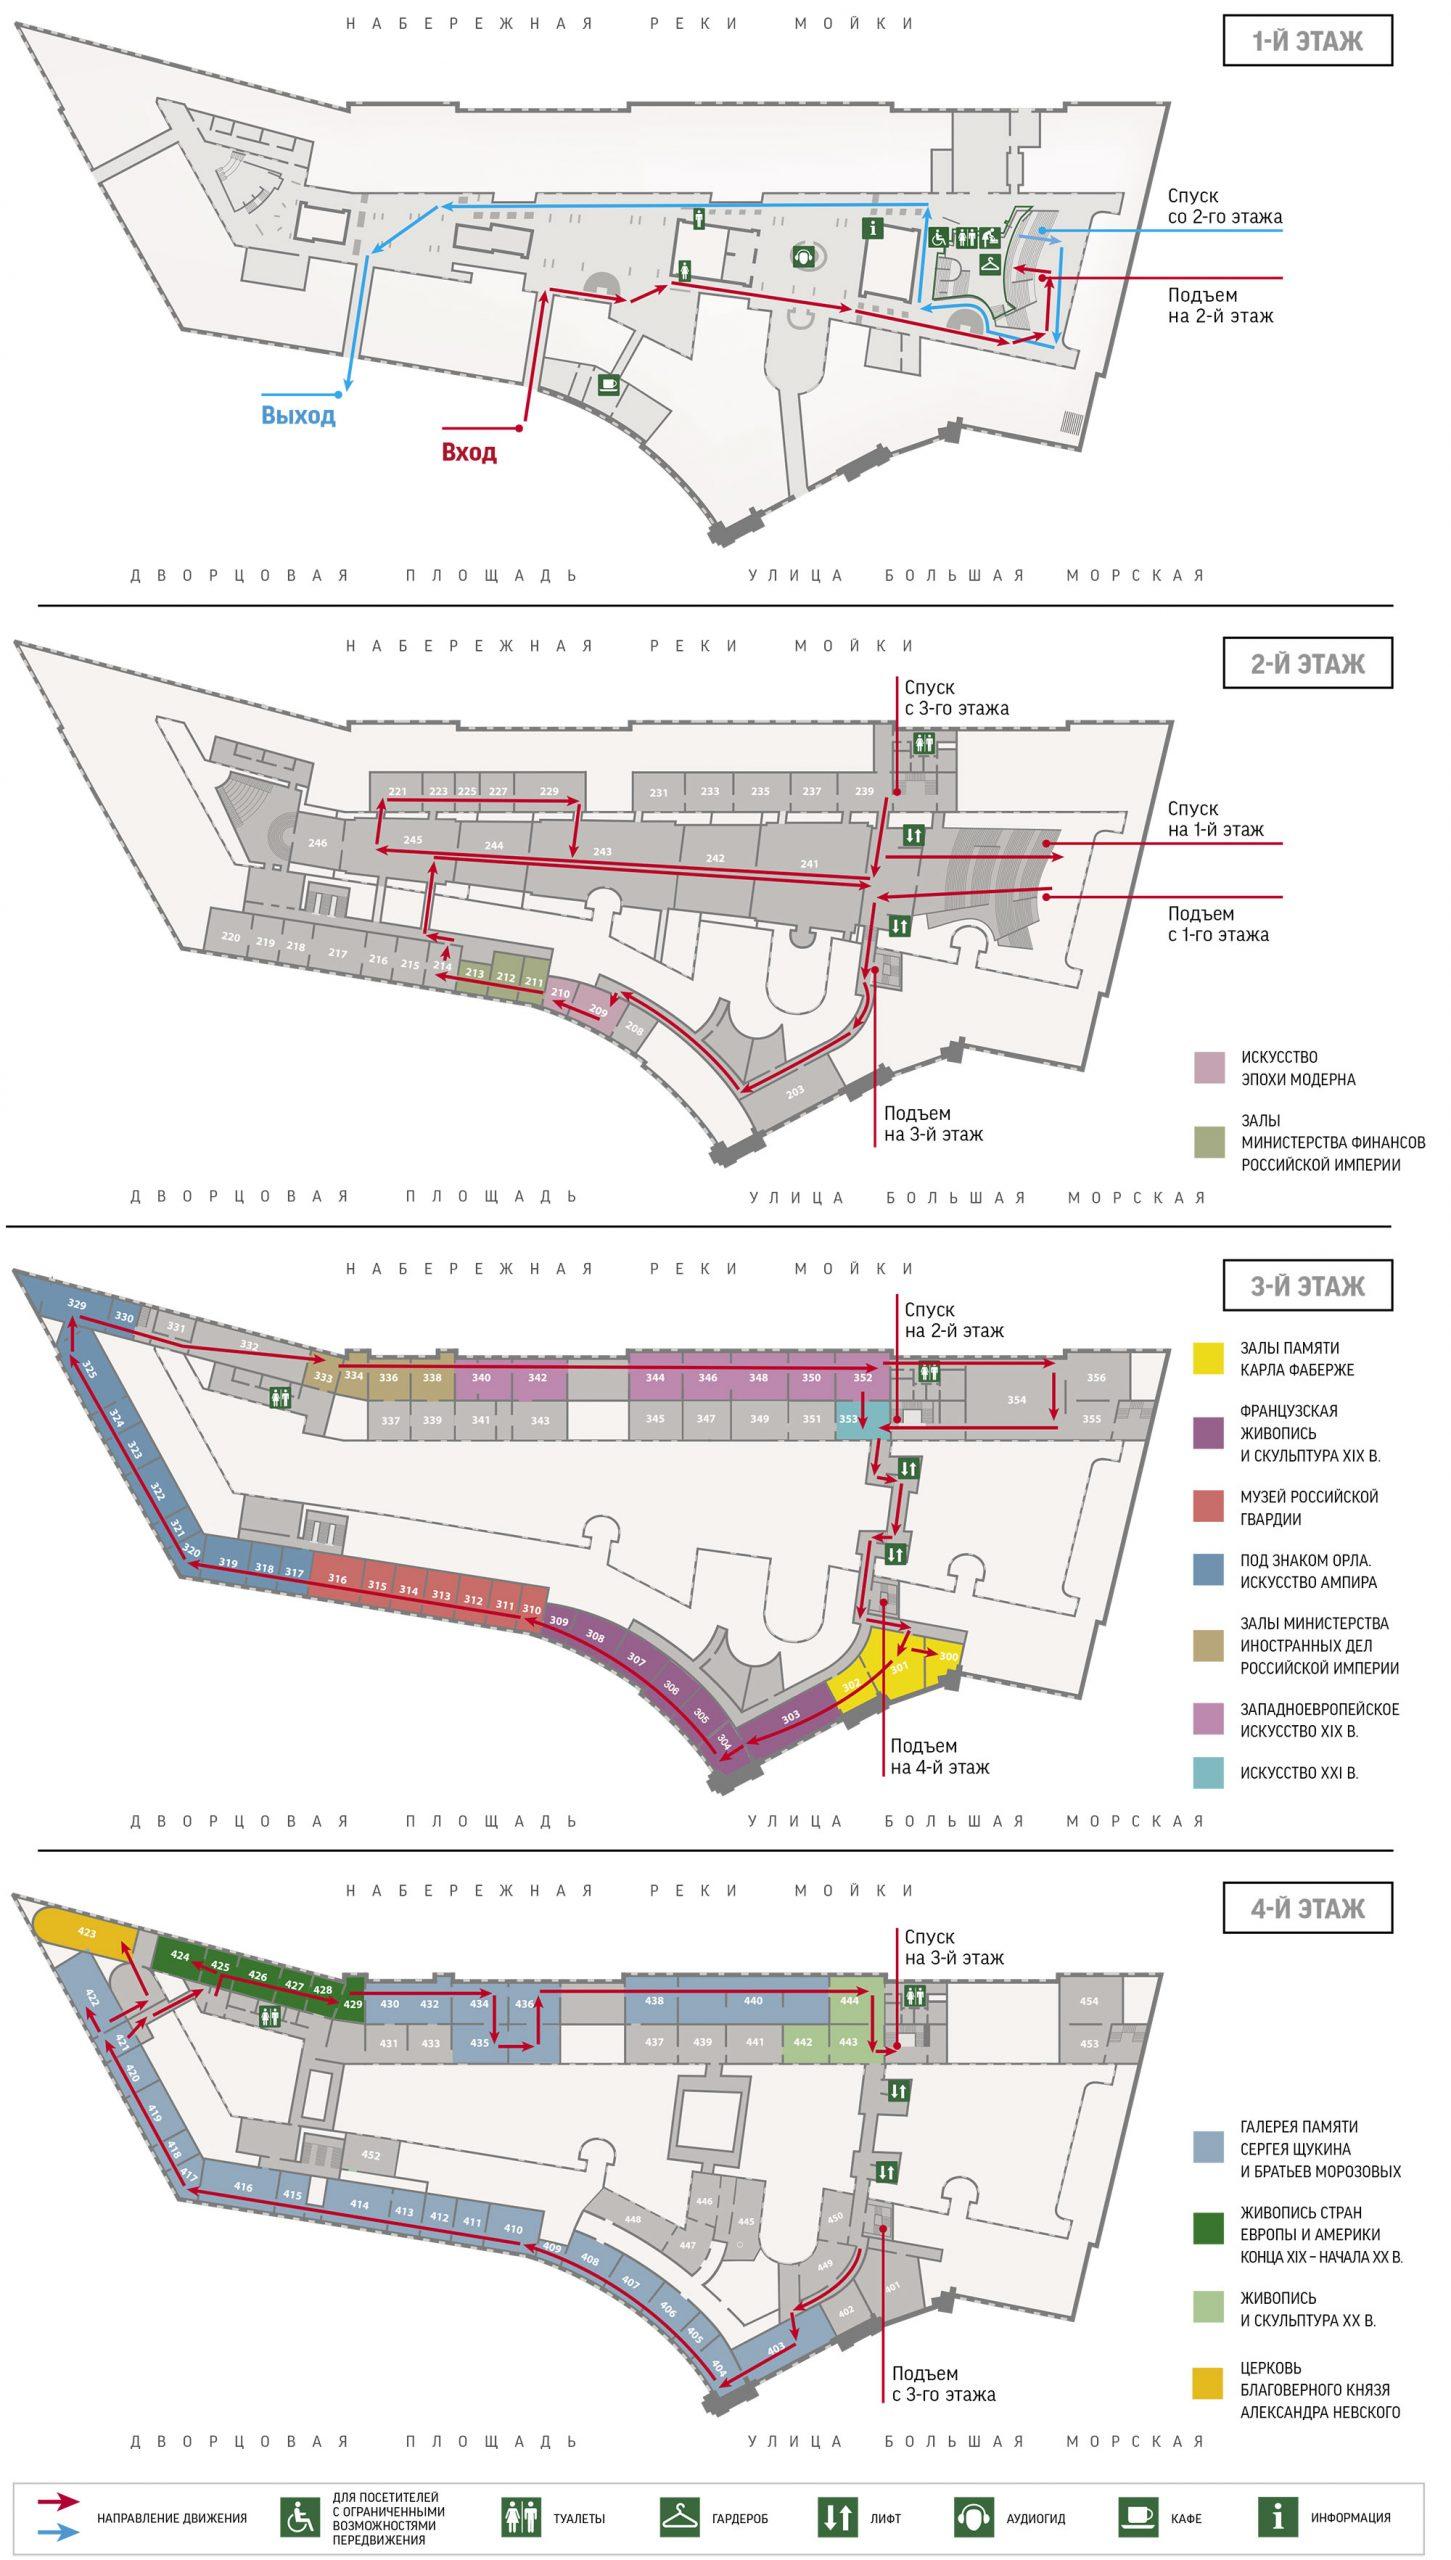 План-схема маршрута №3 по Эрмитажу